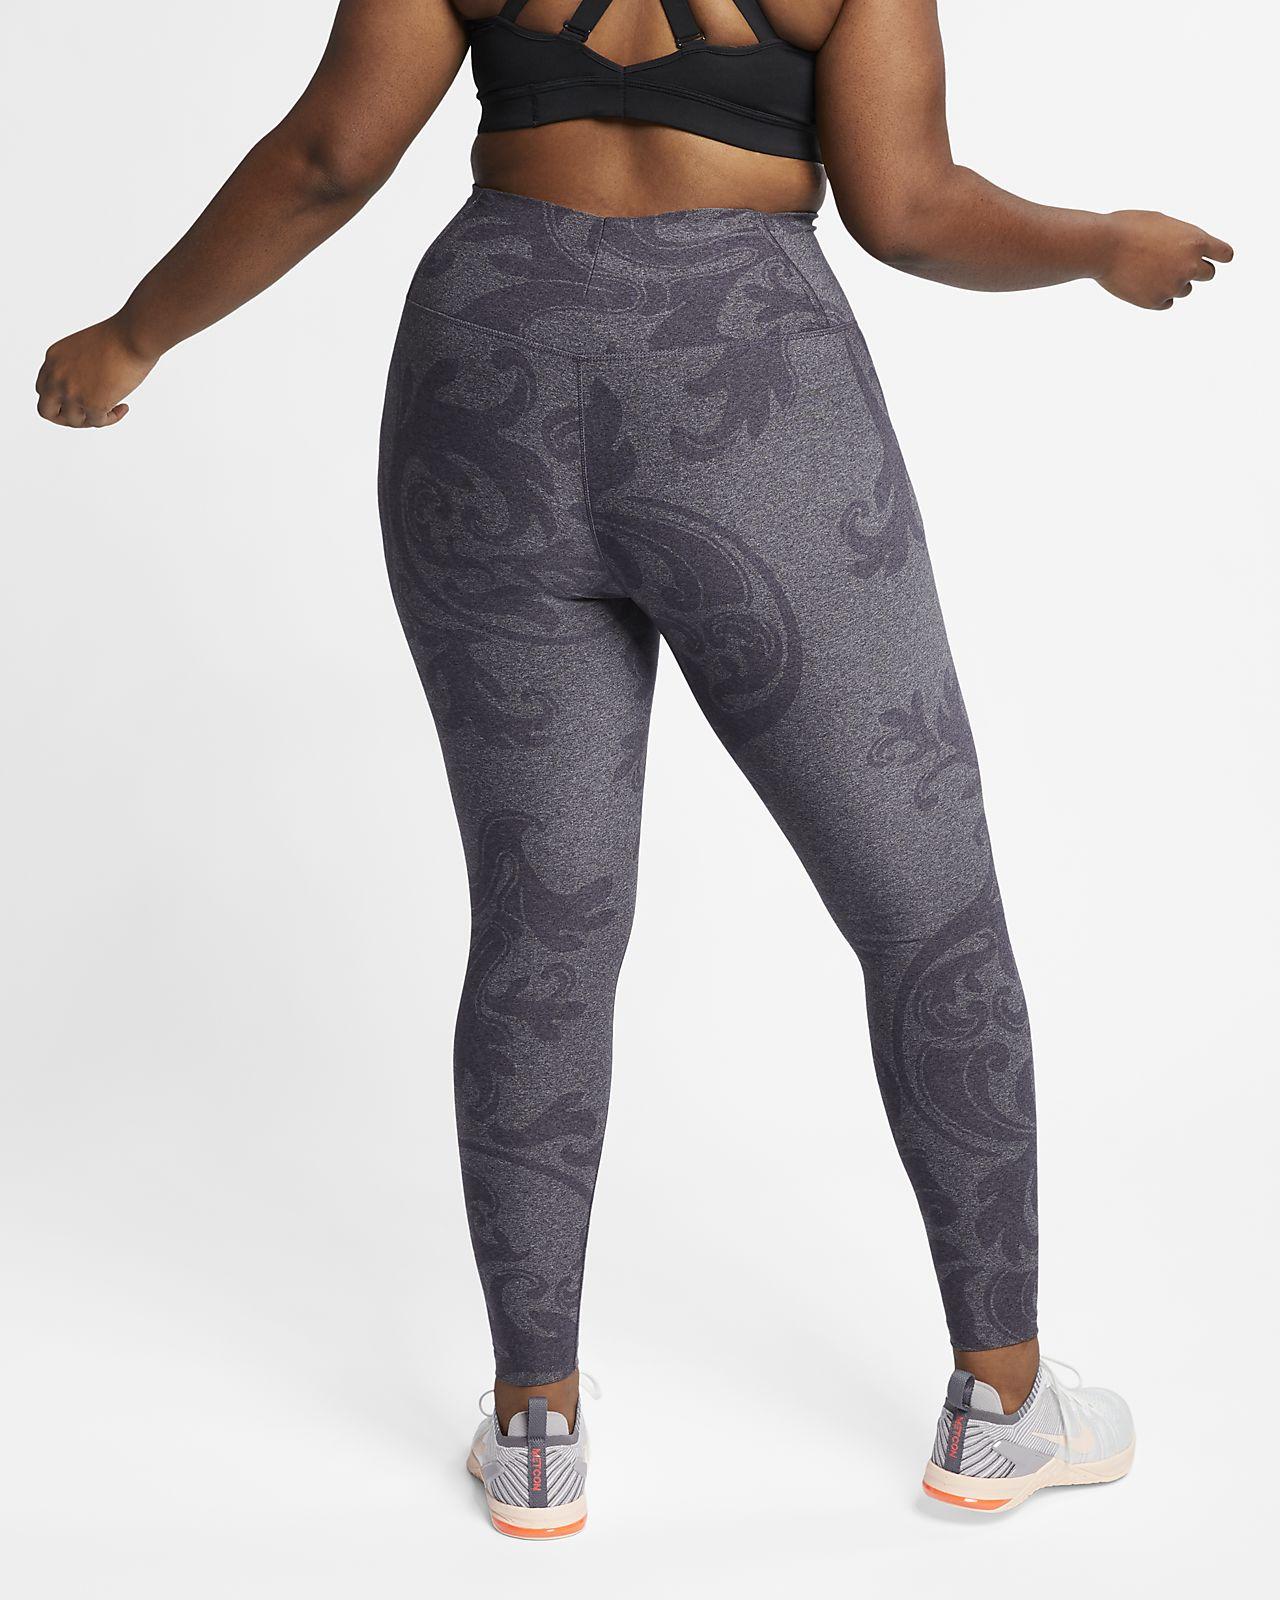 97df99e0e2dbd ... Nike Dri-FIT Power Studio Women's Printed Training Tights (Plus Size)